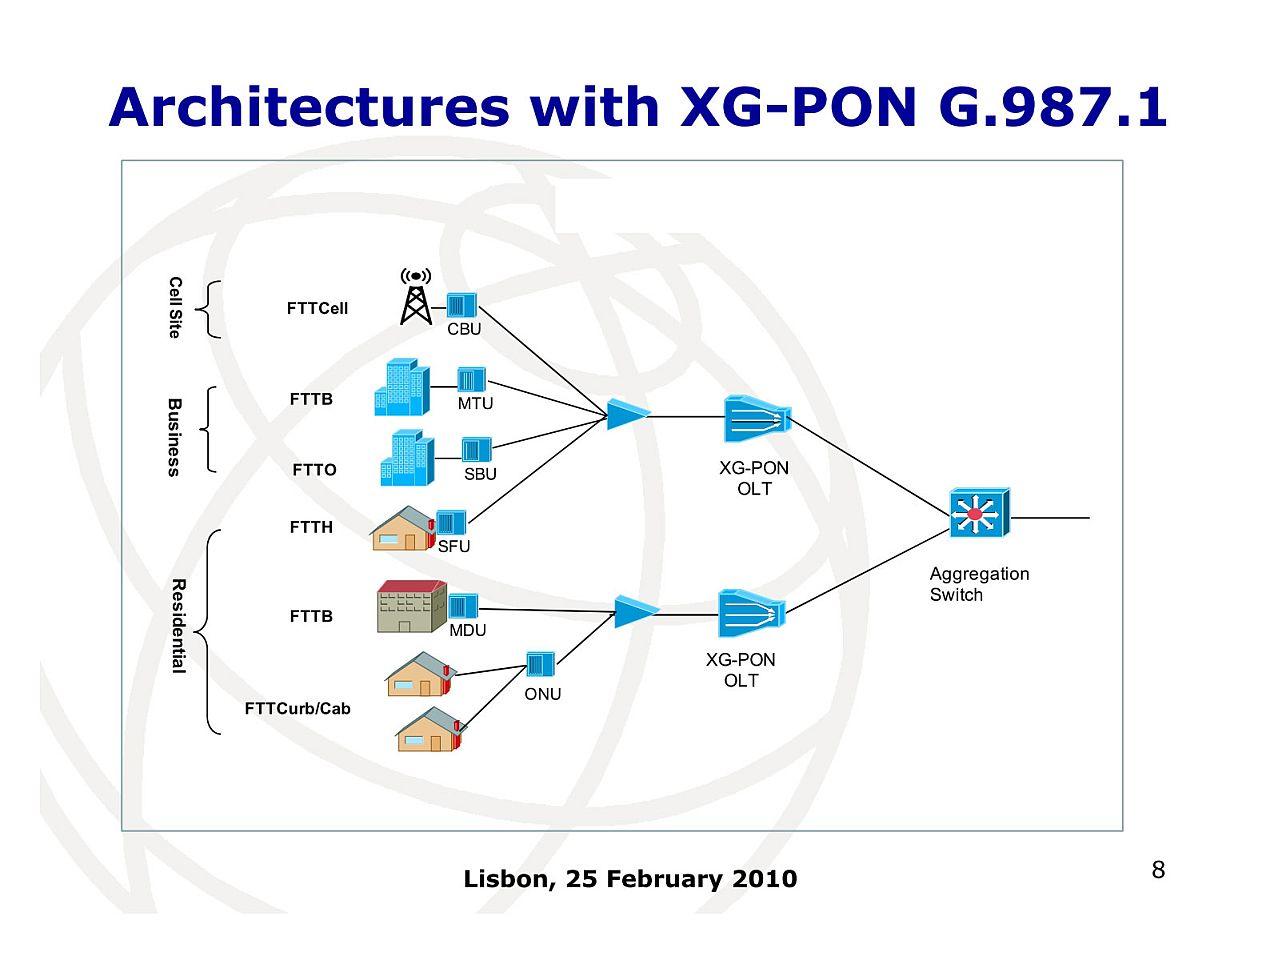 "<a href=""https://www.itu.int/en/ITU-T/studygroups/com15/Documents/tutorials/Optical_access_transmission.pdf"" class=""n"" target=""_blank"">FTTH Conference 2010におけるFrance TelecomのFabrice BOURGARTのプレゼンテーション(PDF)</a>より抜粋。一番上が「FTTCell」"